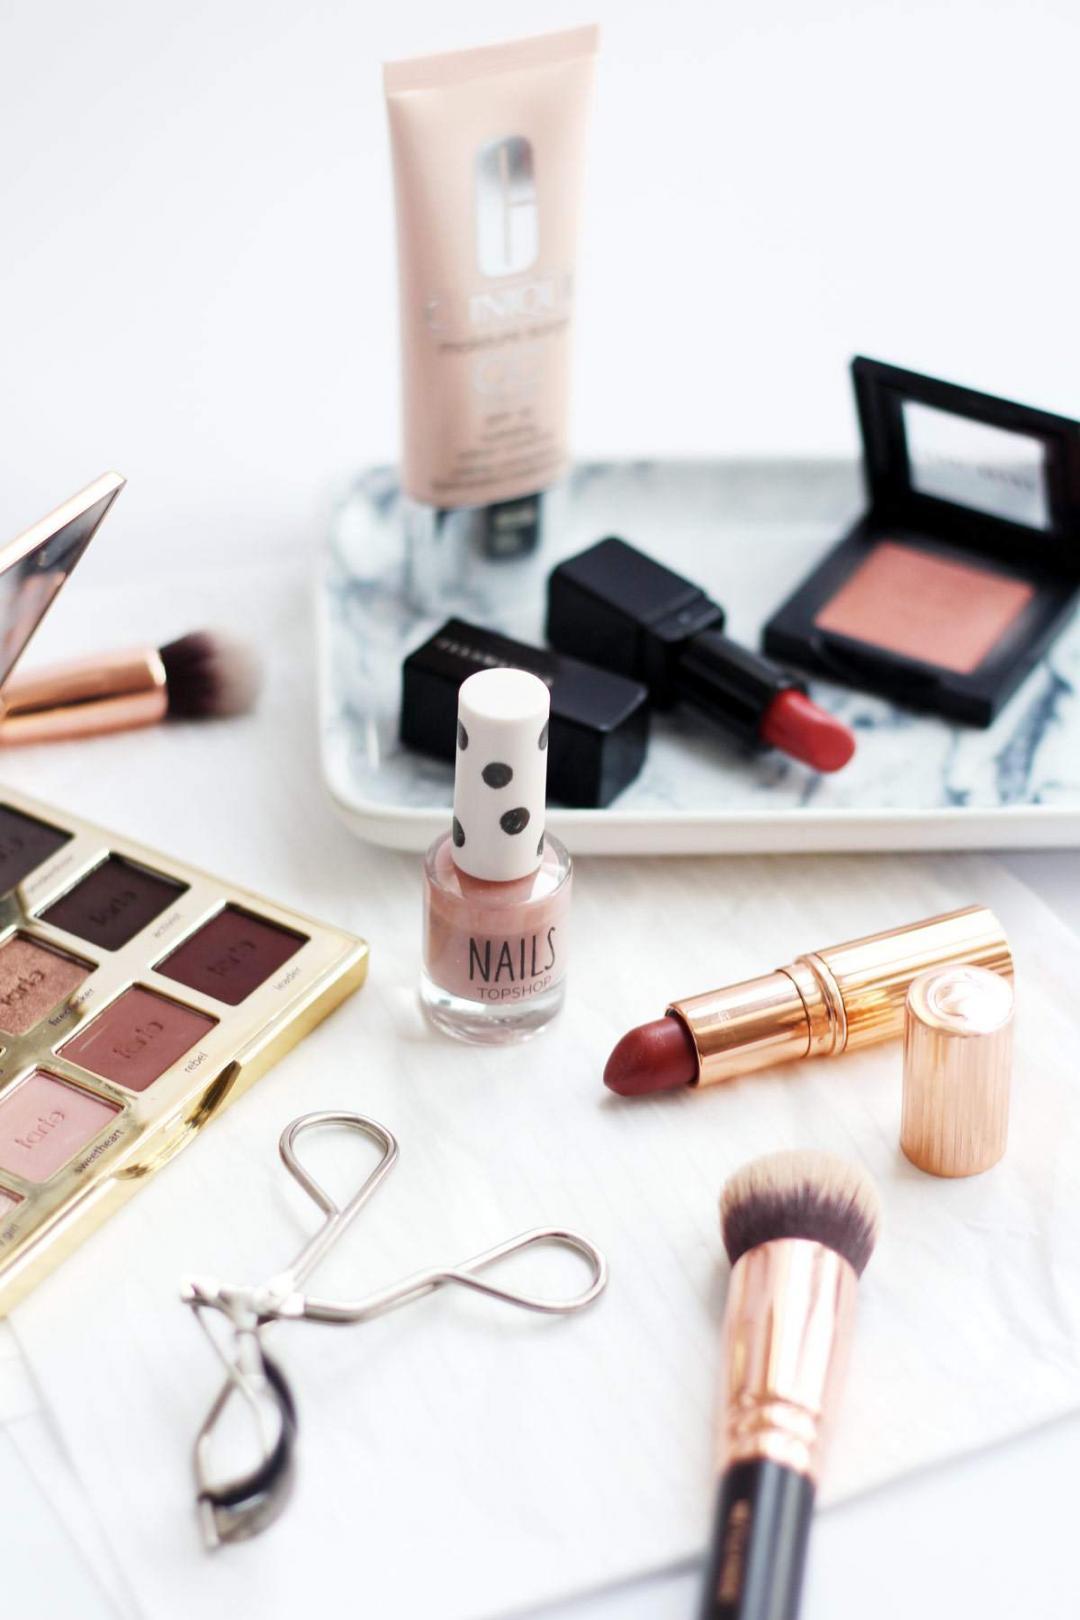 peach-makeup-charlotte-tilbury-stoned-rose-illamasqua-cherub-tartlette-palette